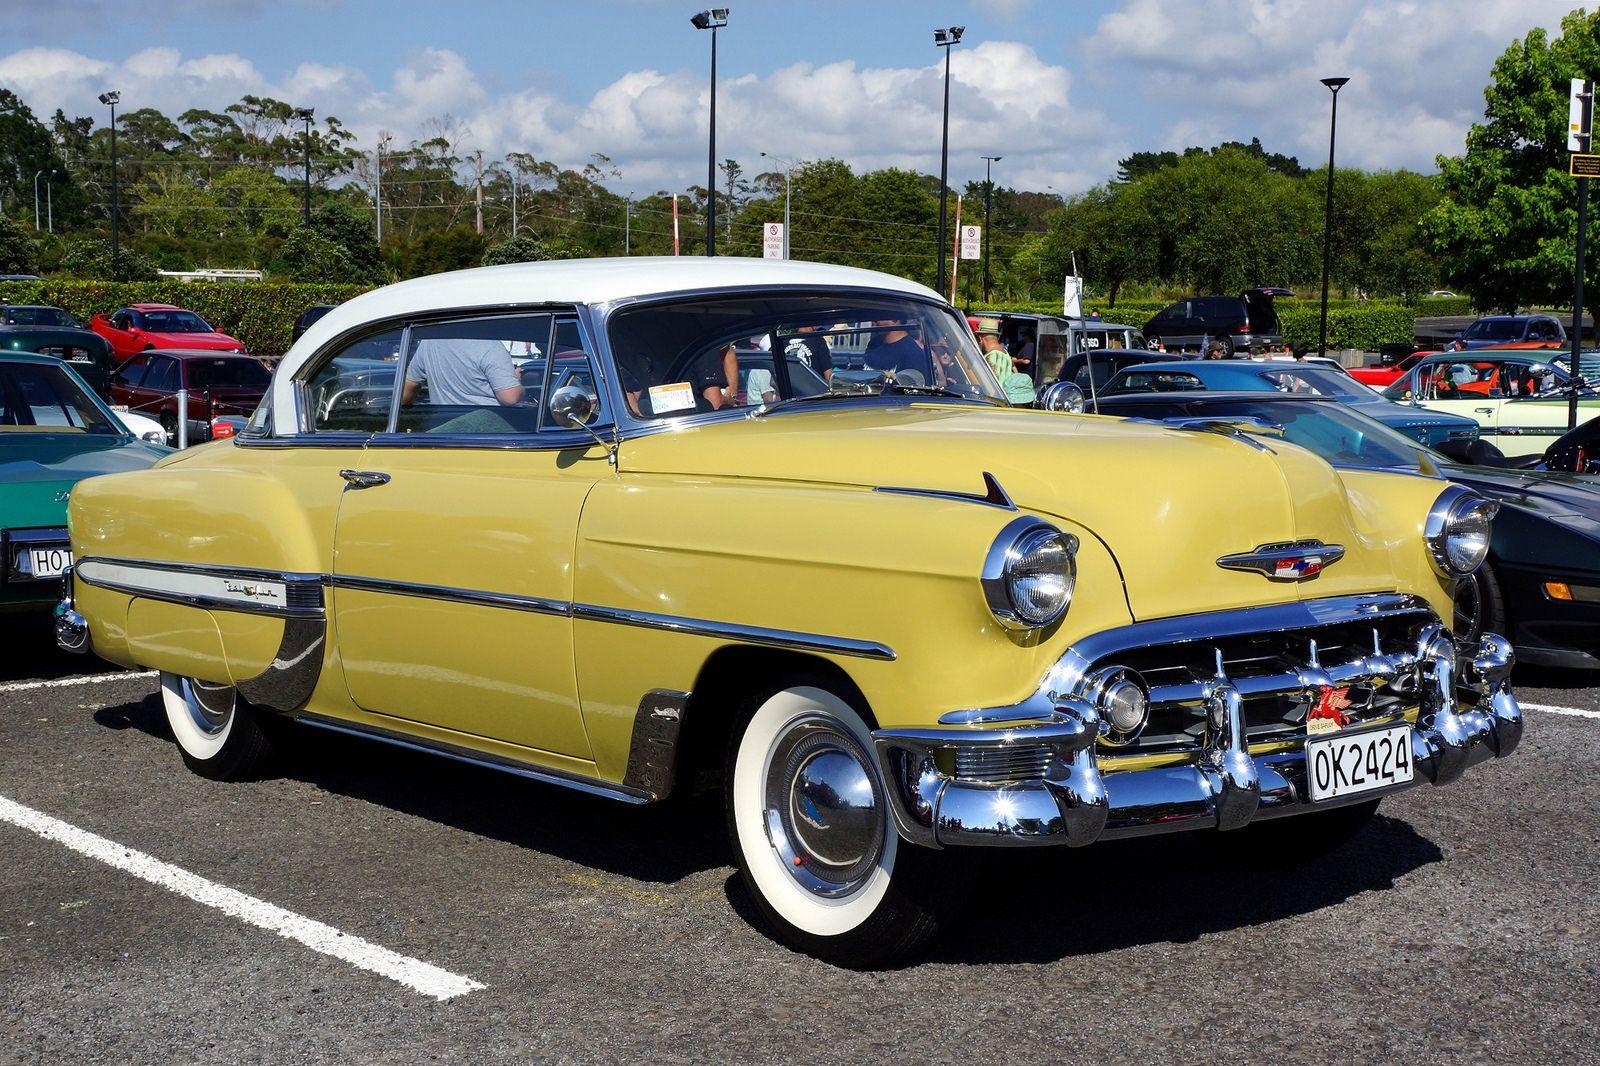 1953 Chevrolet .Bel Air